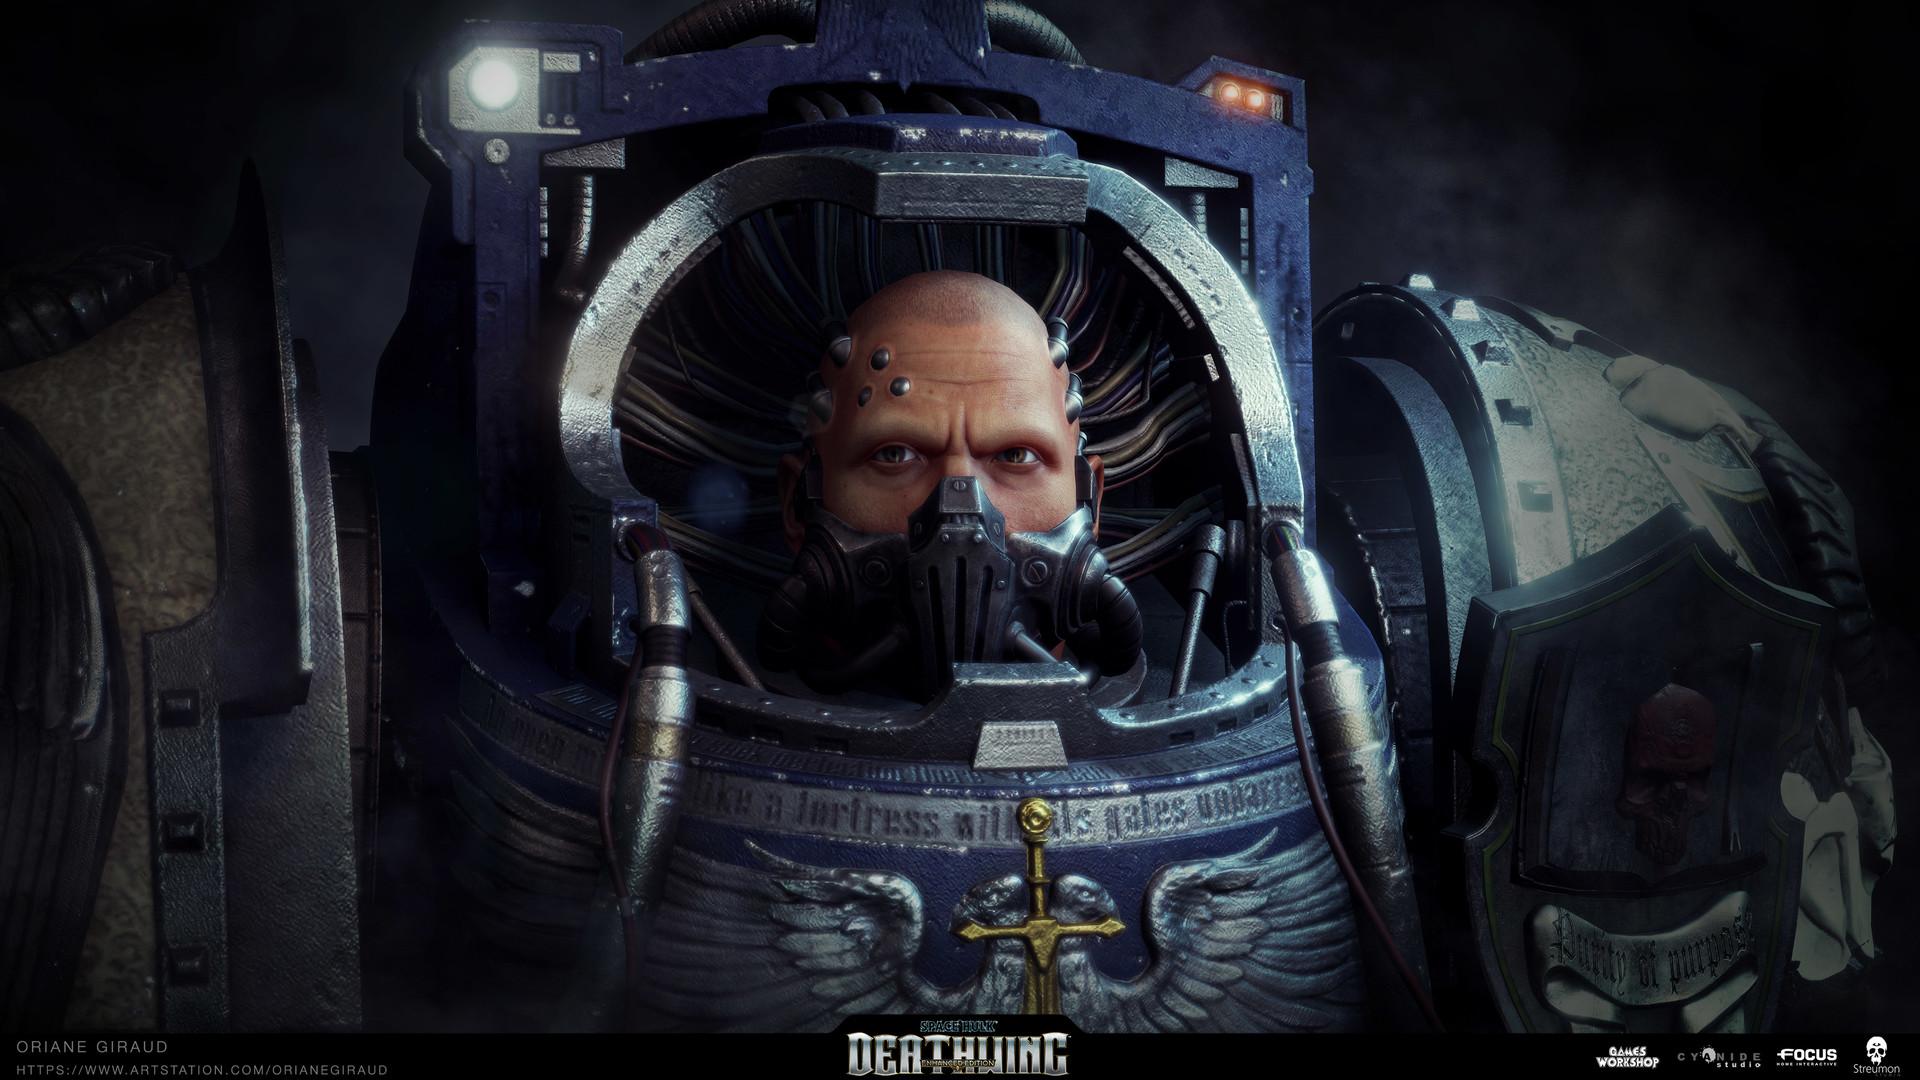 ArtStation - Space Hulk Deathwing - Librarian Heads, Oriane Giraud